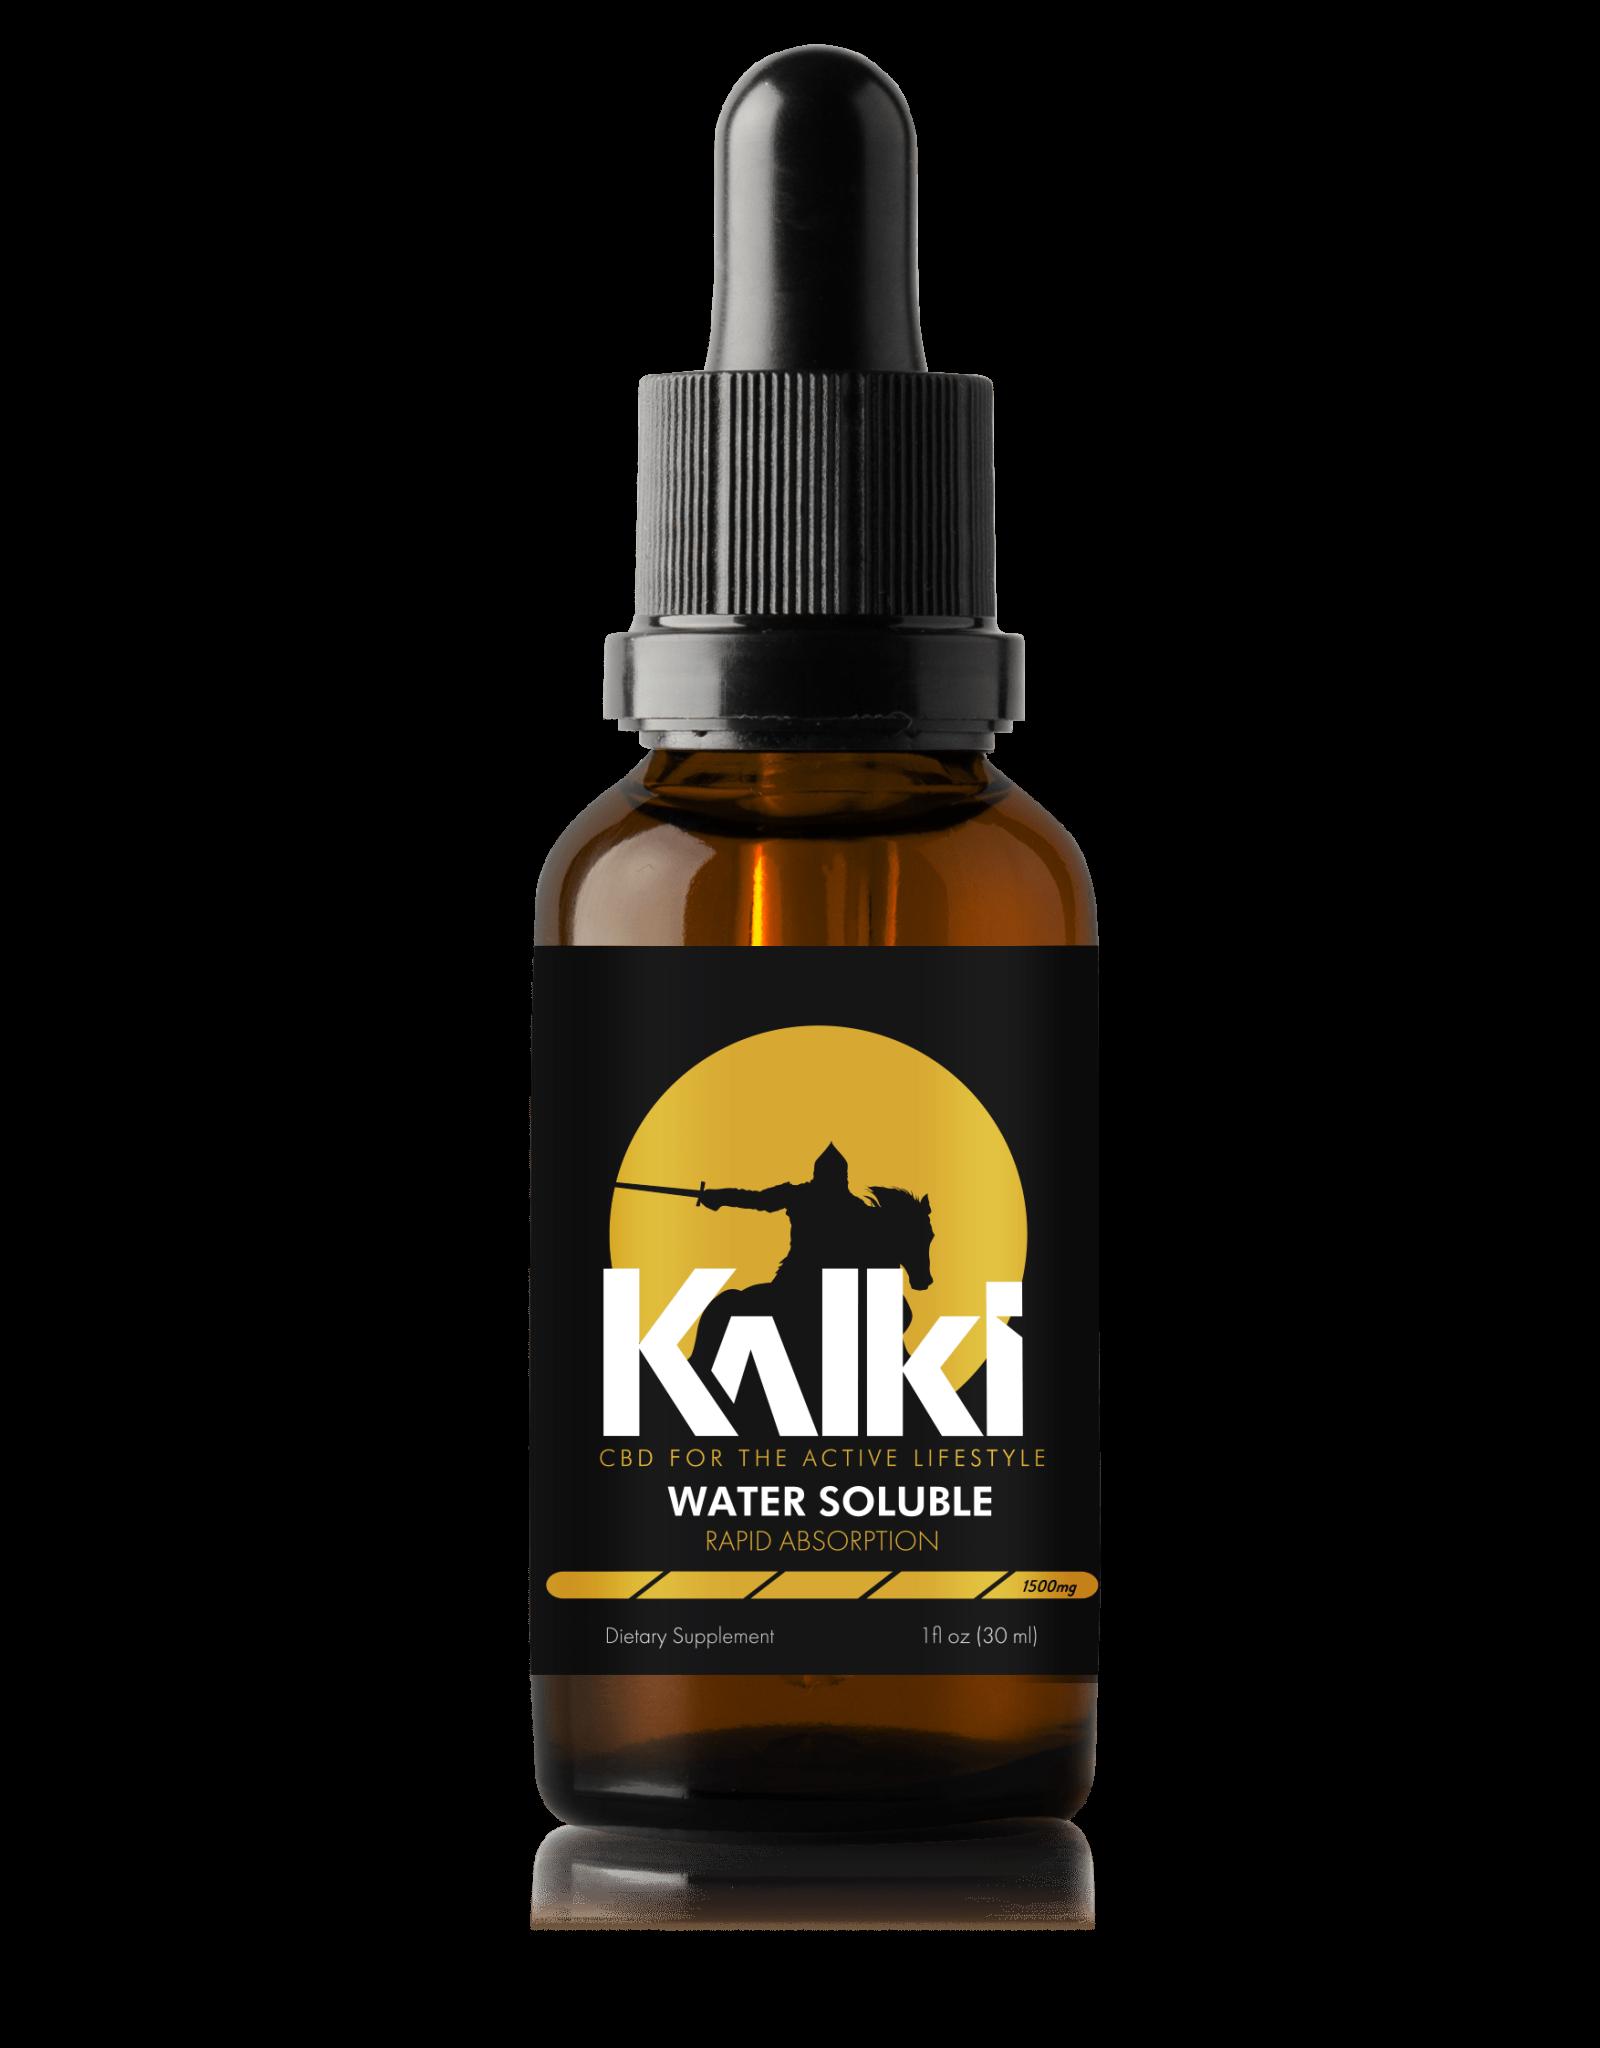 Hemplucid Kalki Water Soluble CBD Oil Tincture 1000mg